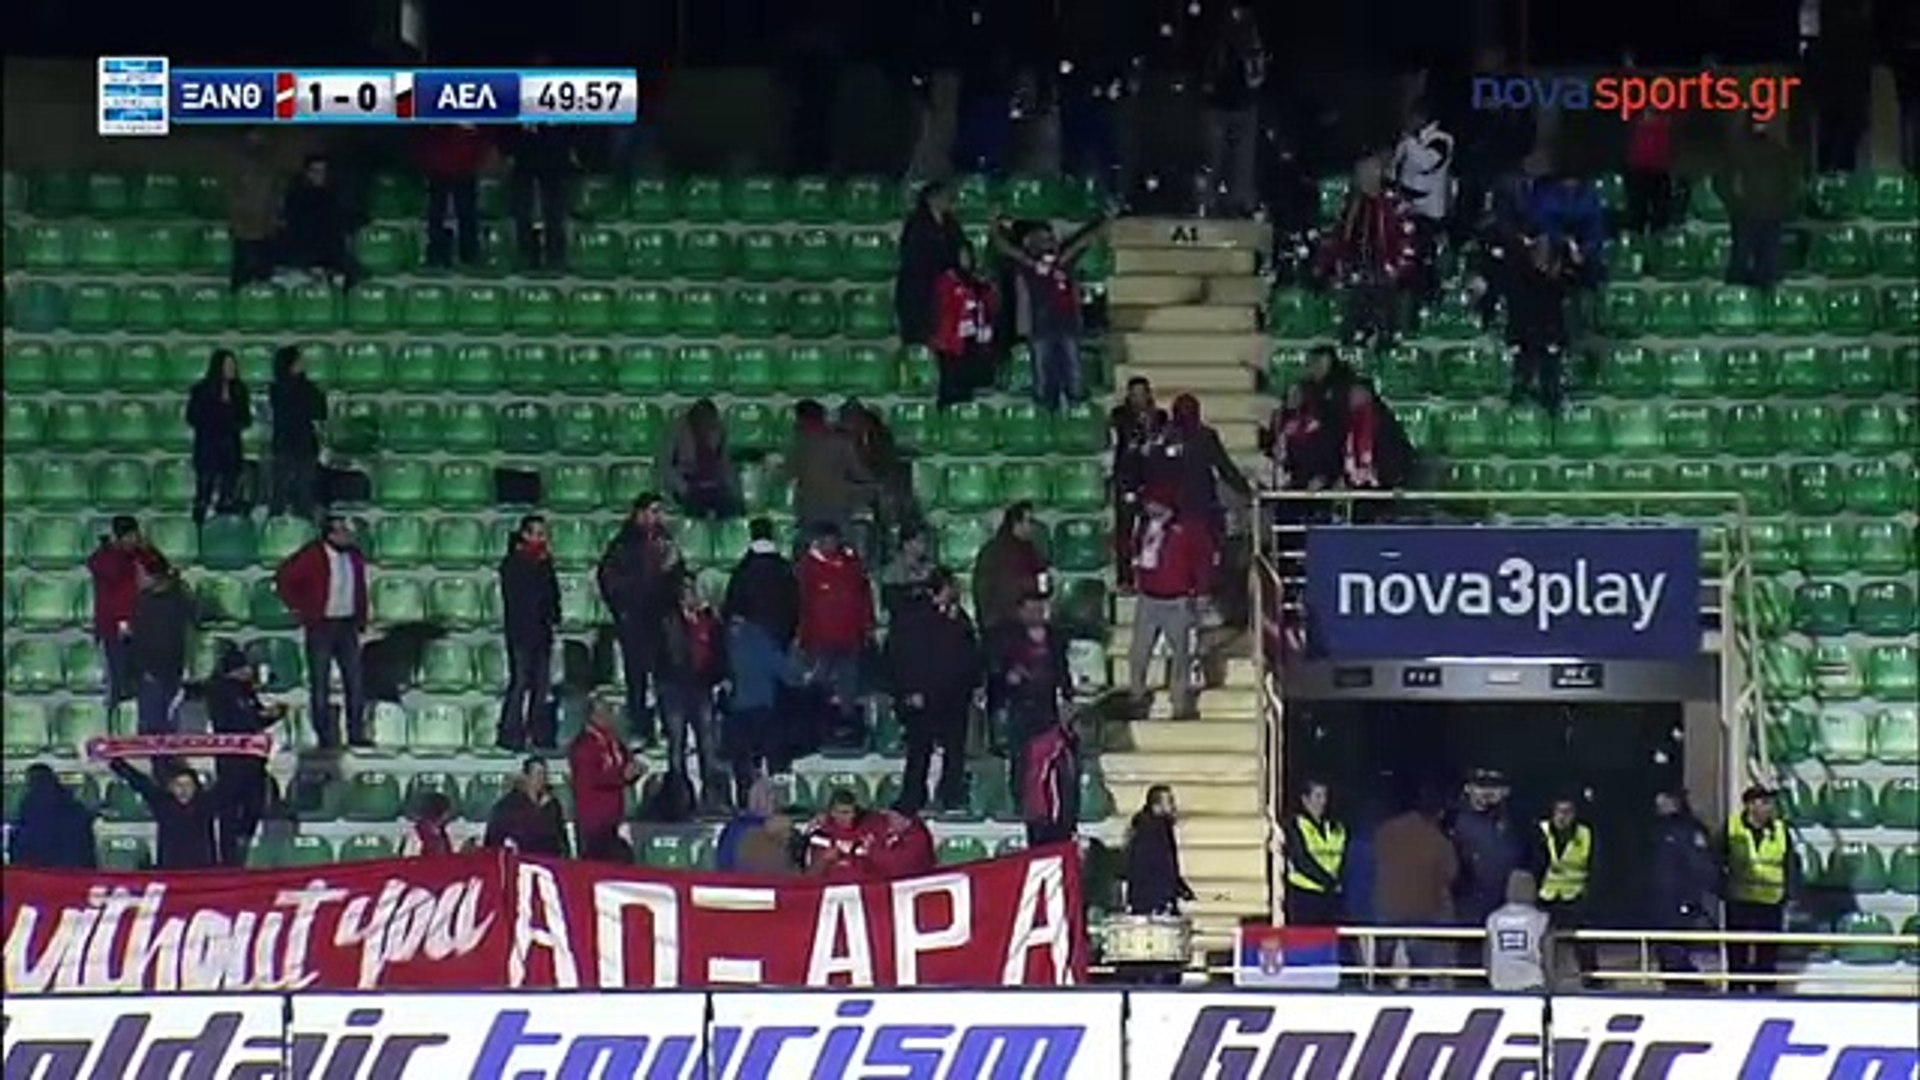 Superliga de Grecia 2016/17: J14 - Skoda Xanthi 1 - 0 Larisa - (10.12.2016)